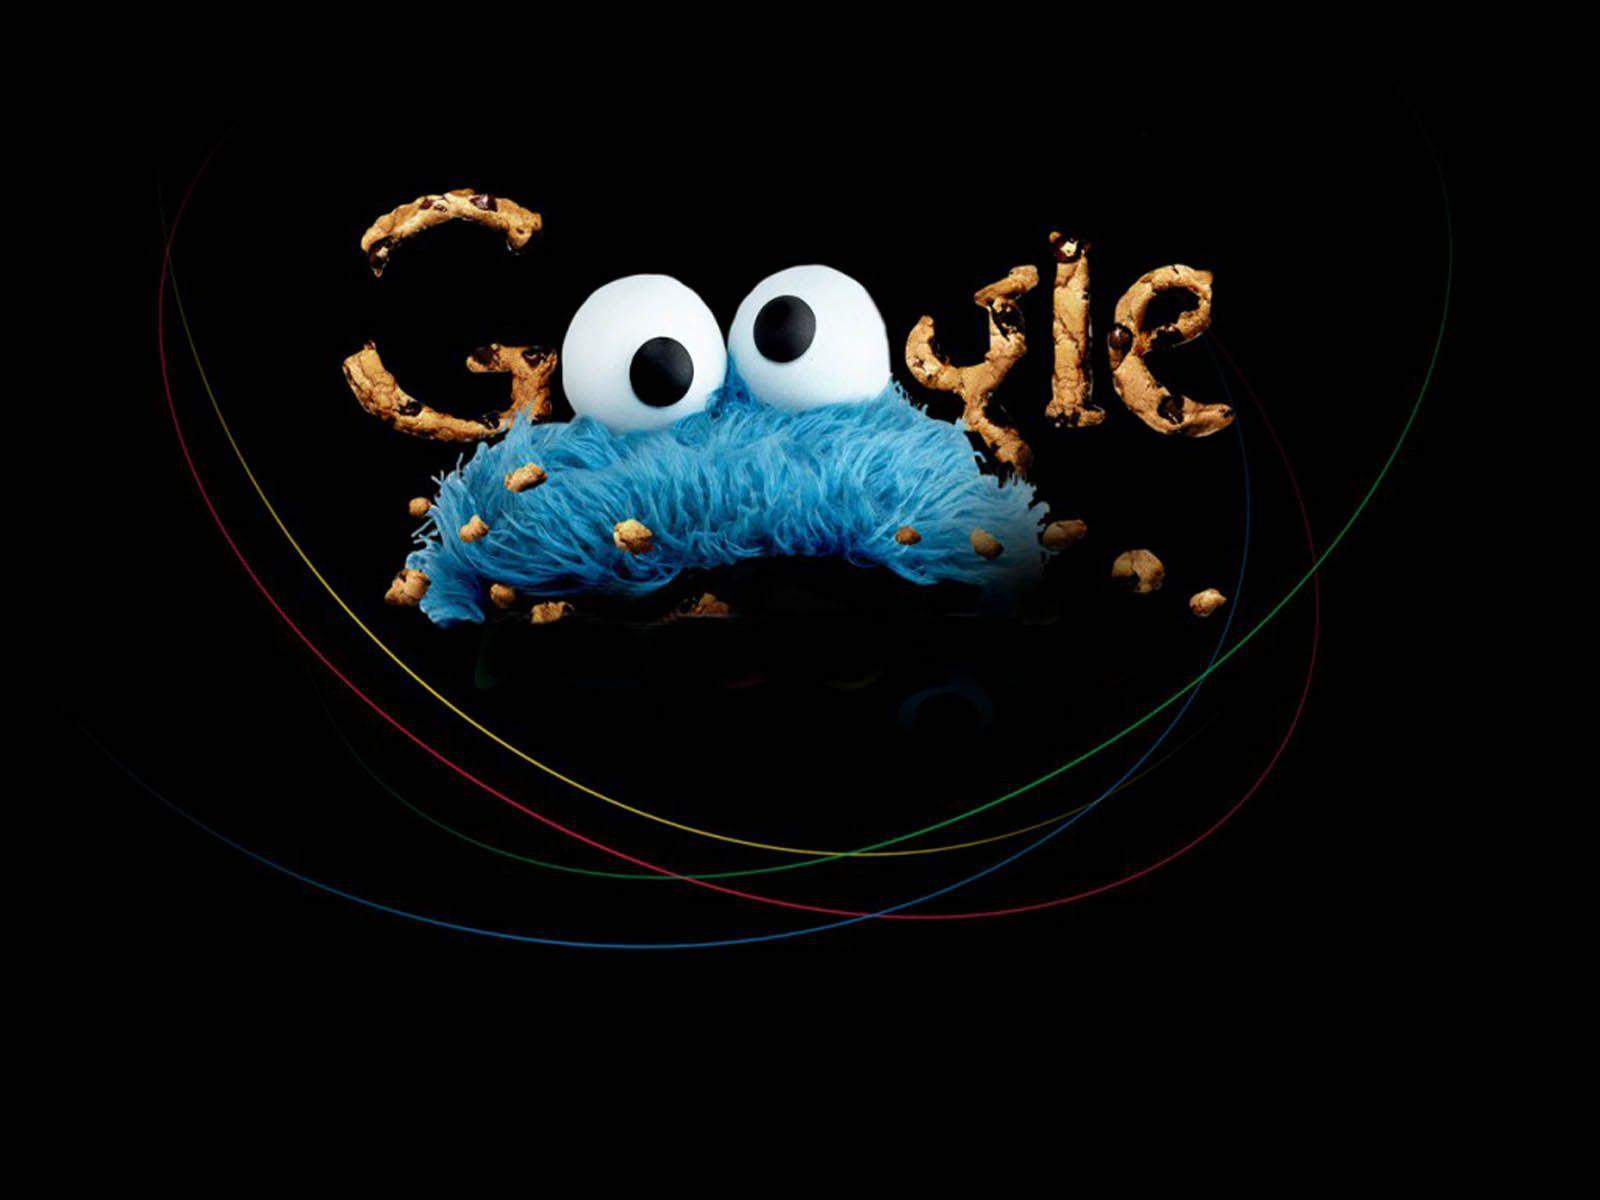 free google background images